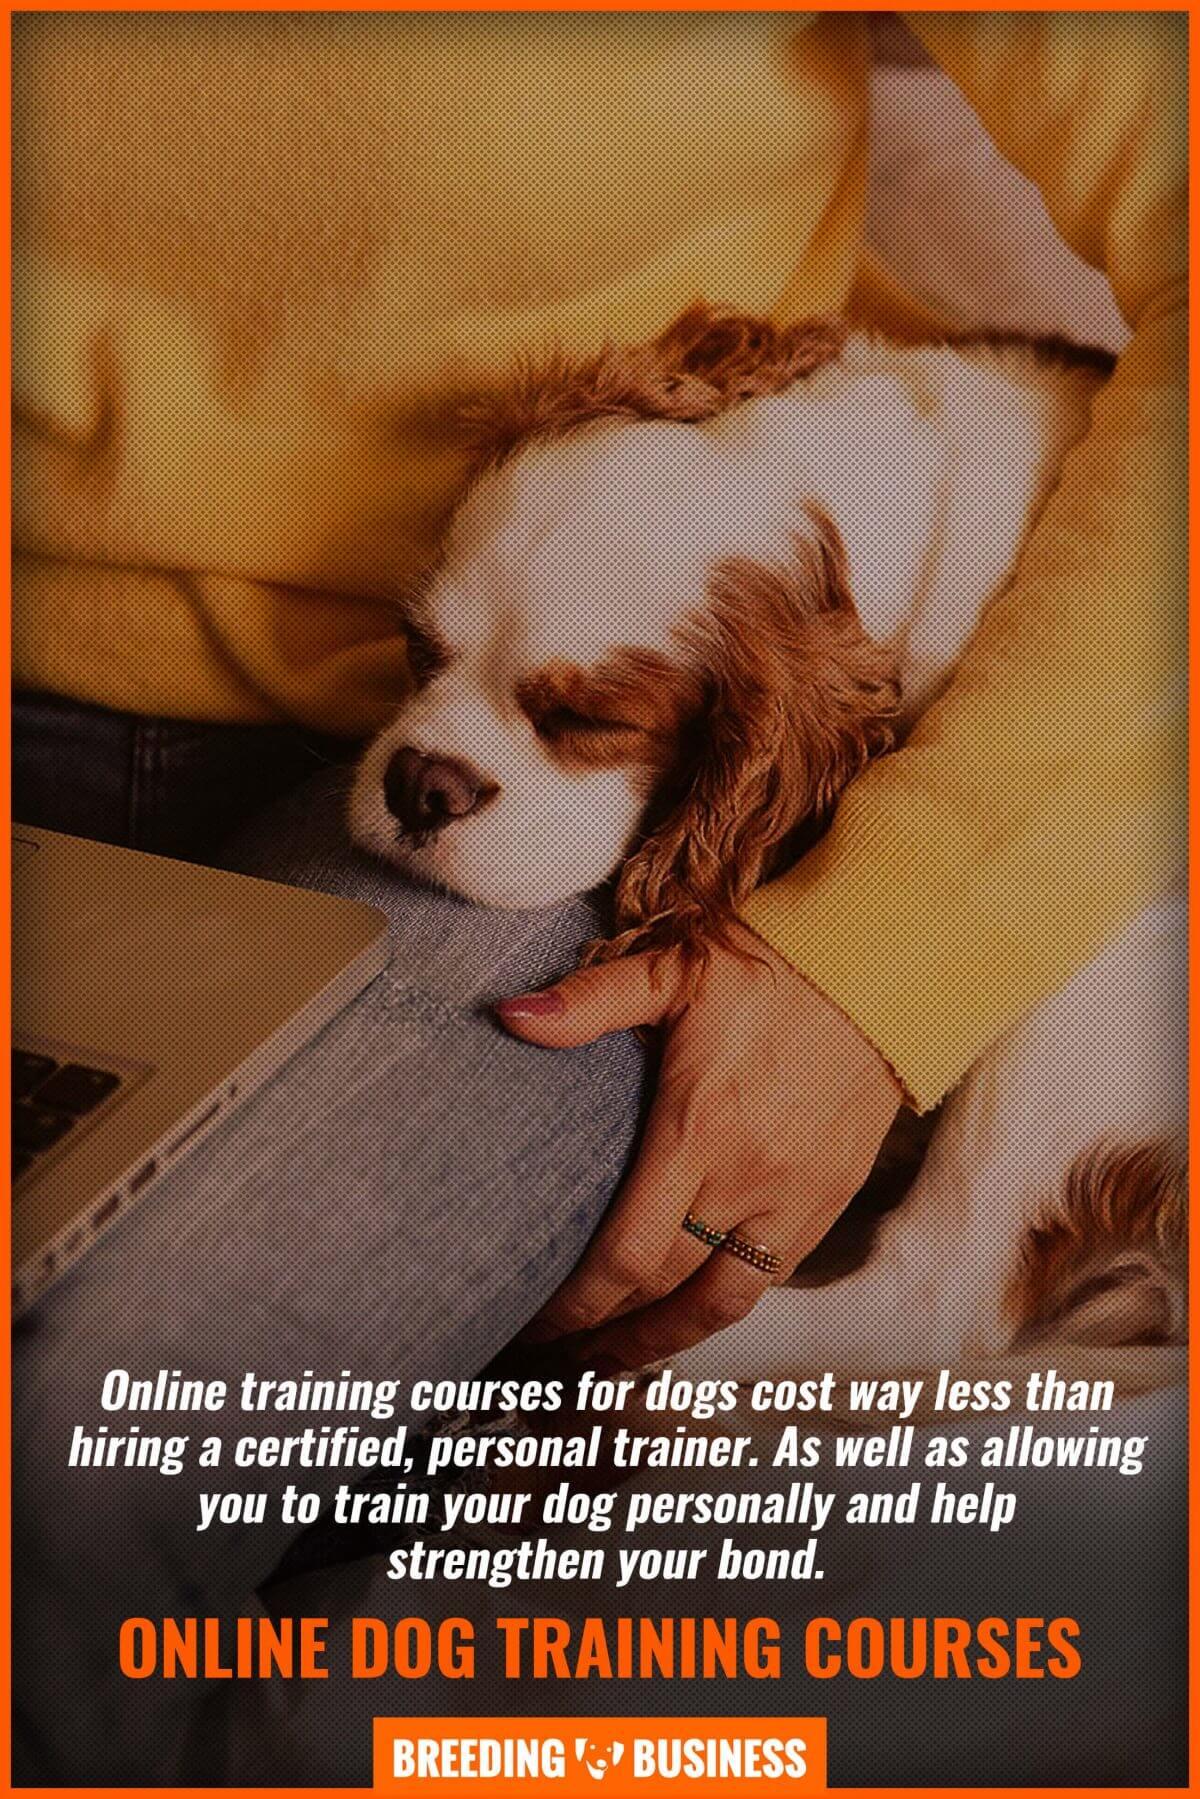 online dog training courses